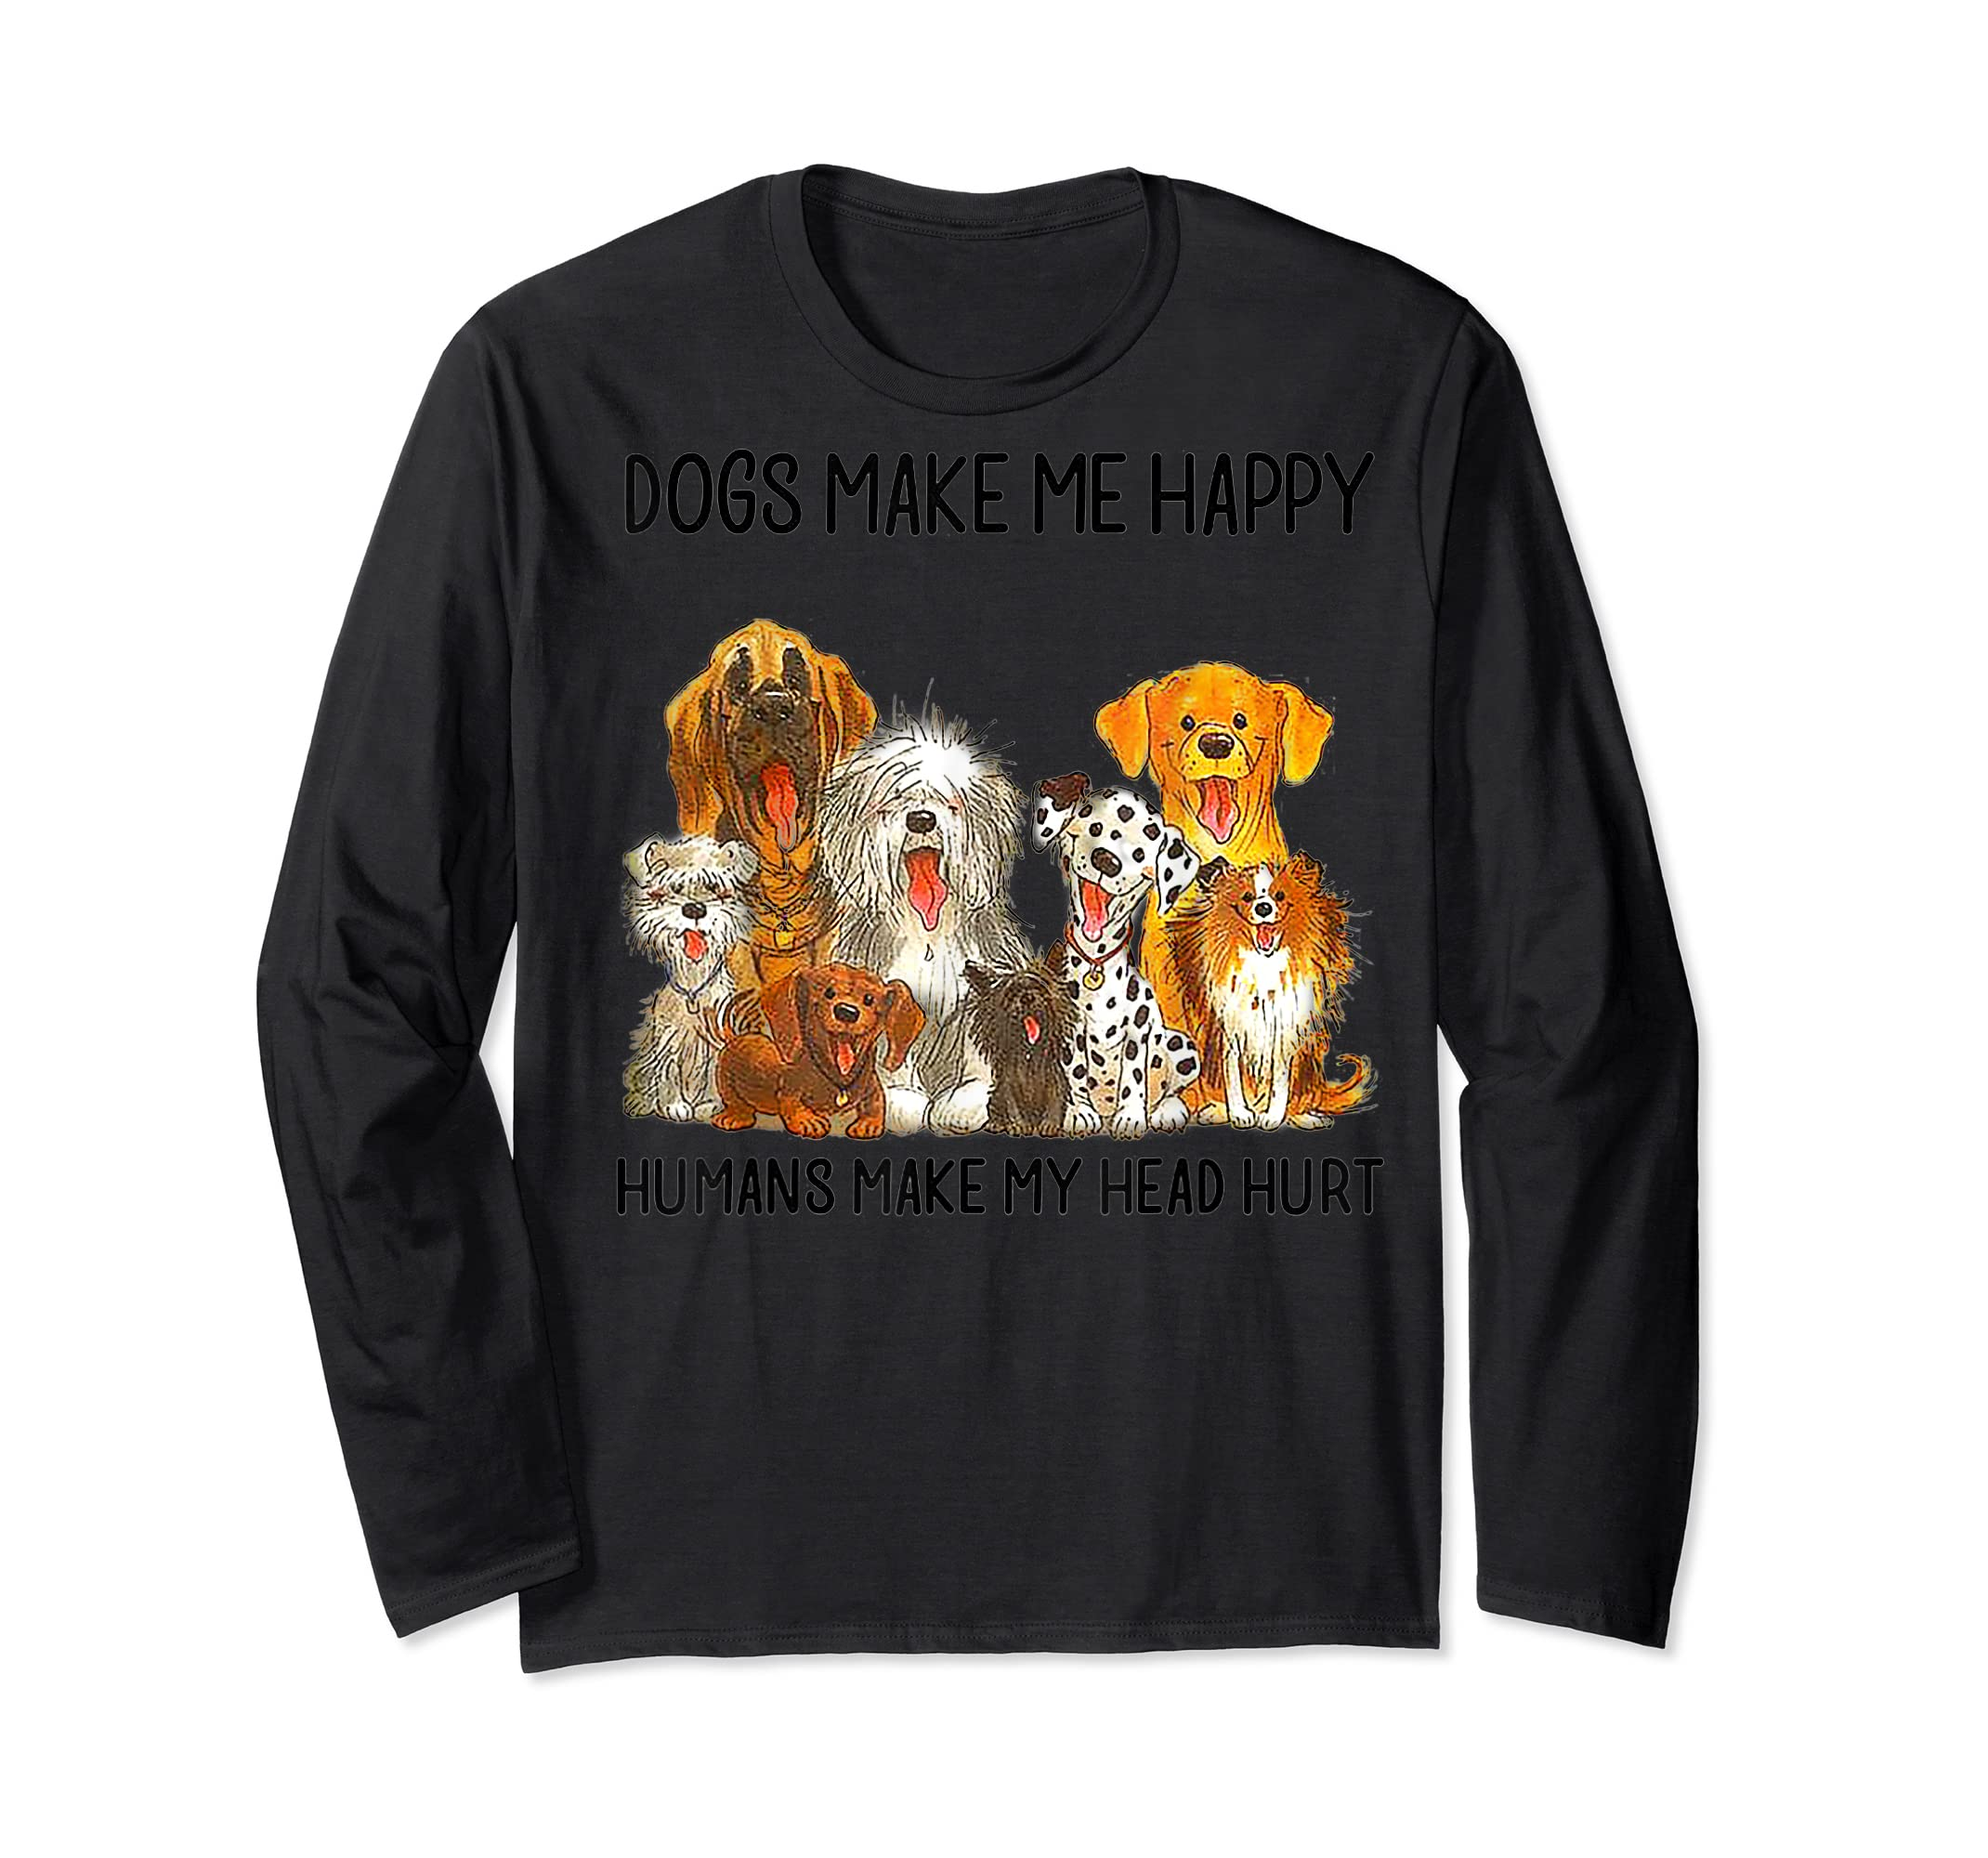 Dogs Make Me Happy Humans Make My Head Hurt Tshirt-Long Sleeve-Black